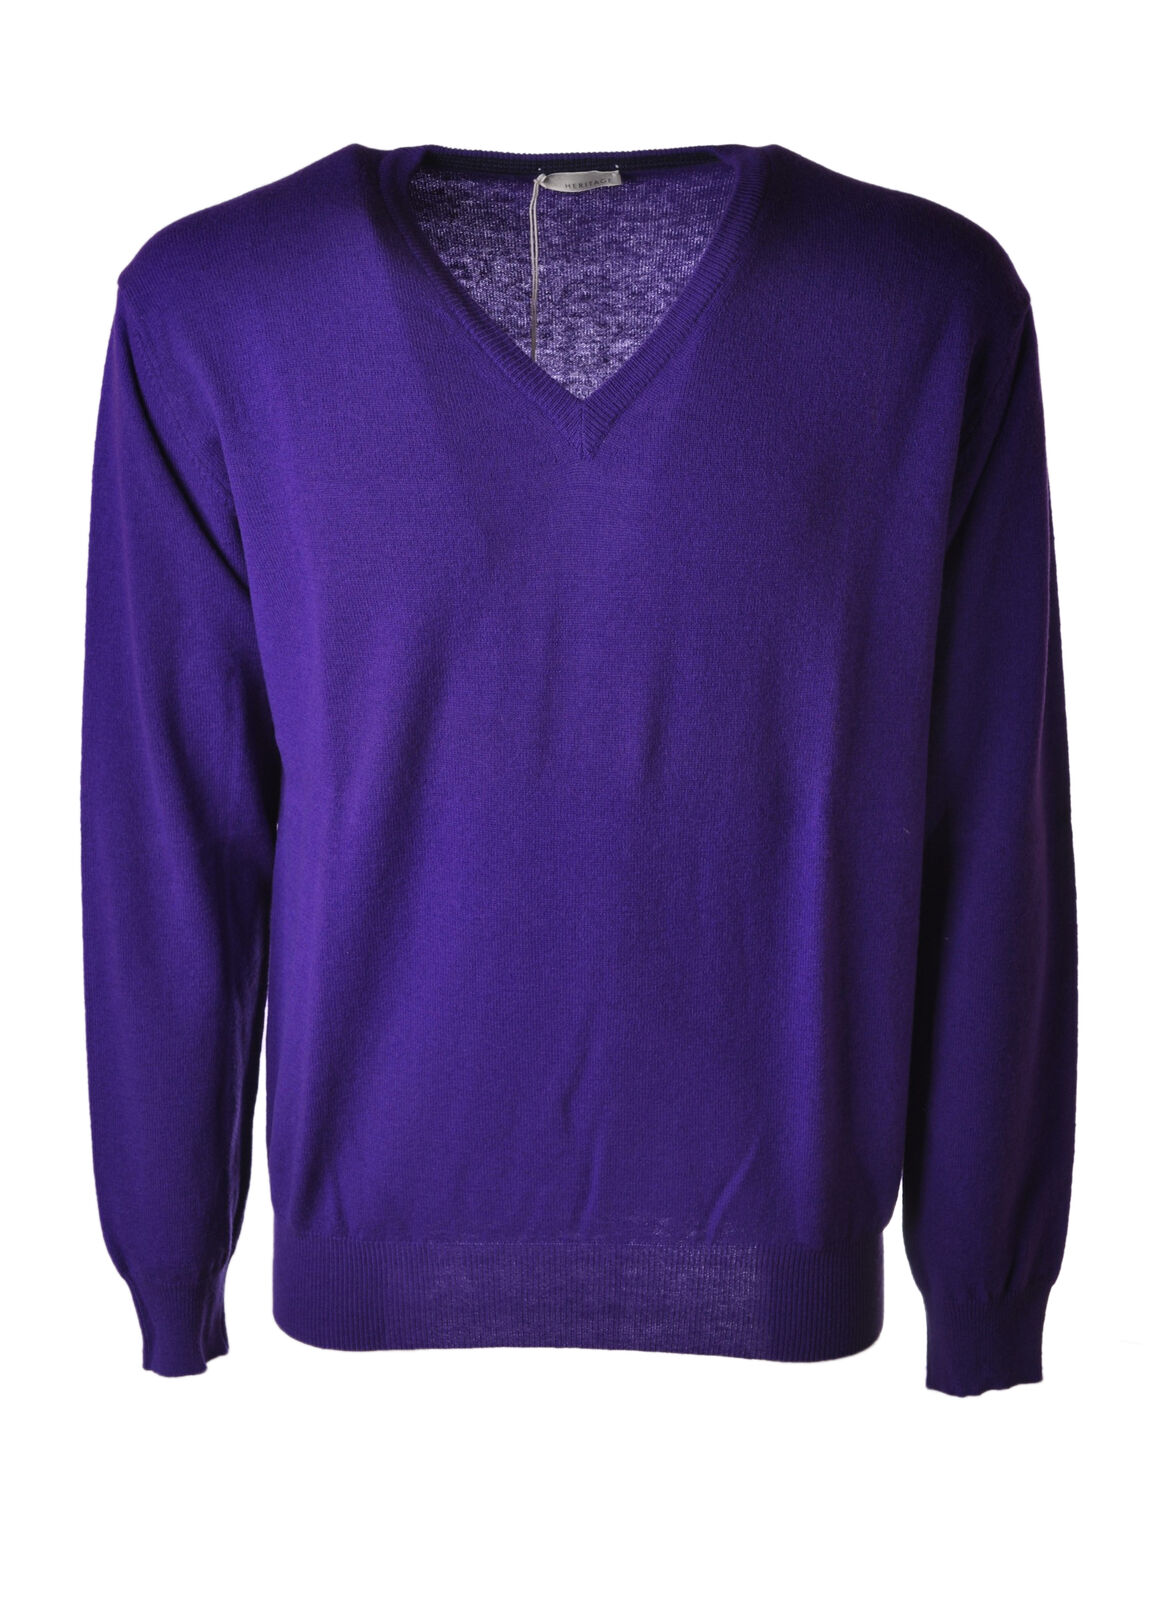 Heritage  -  Sweaters - Male - purple - 4644121A180158